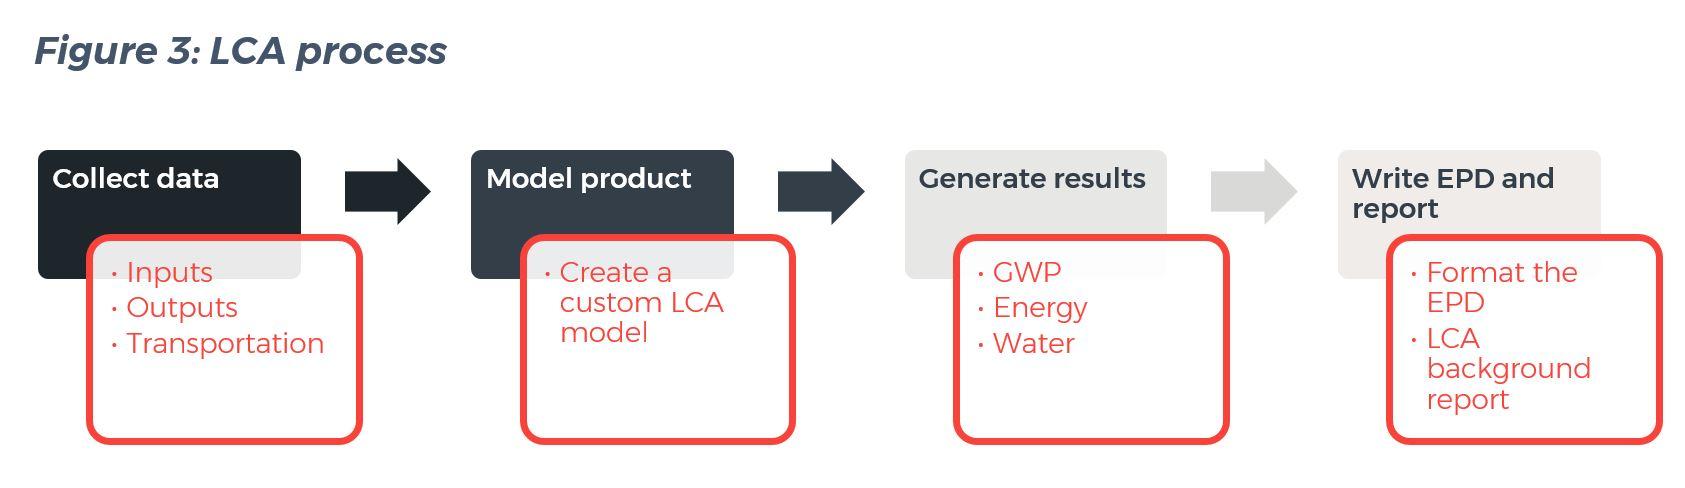 LCA process